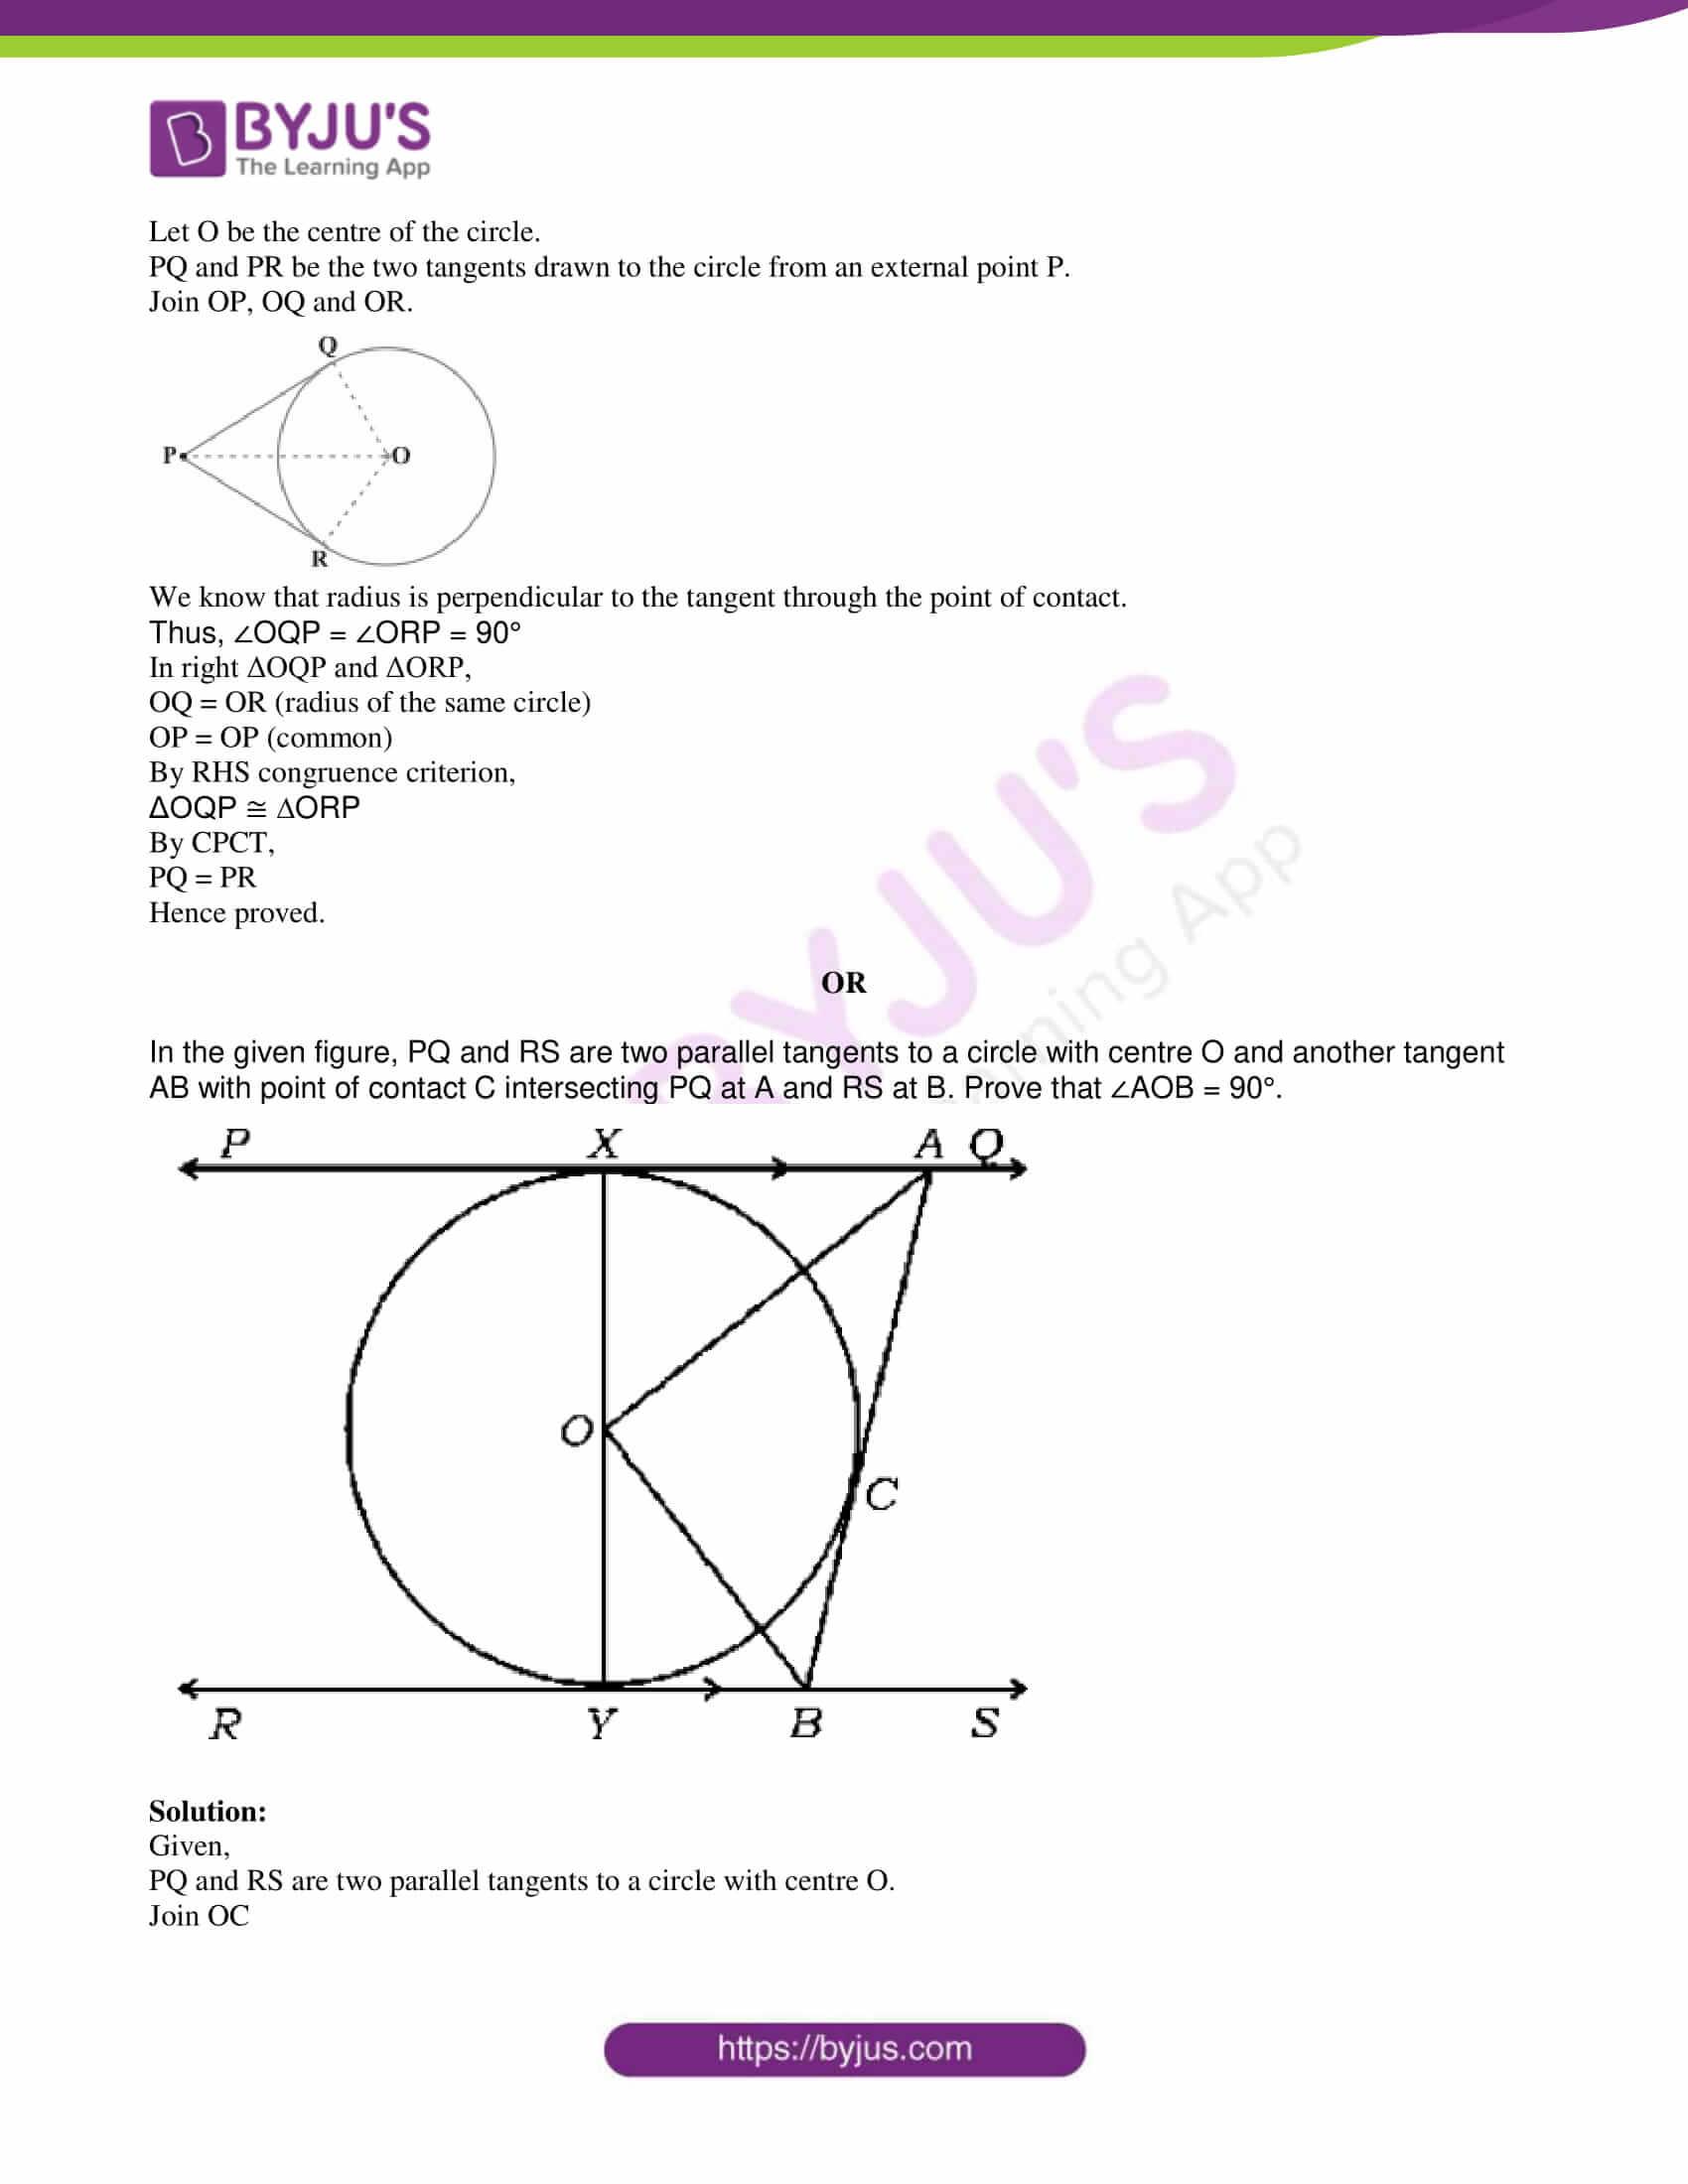 kseeb class 10 maths question paper solution 2019 15